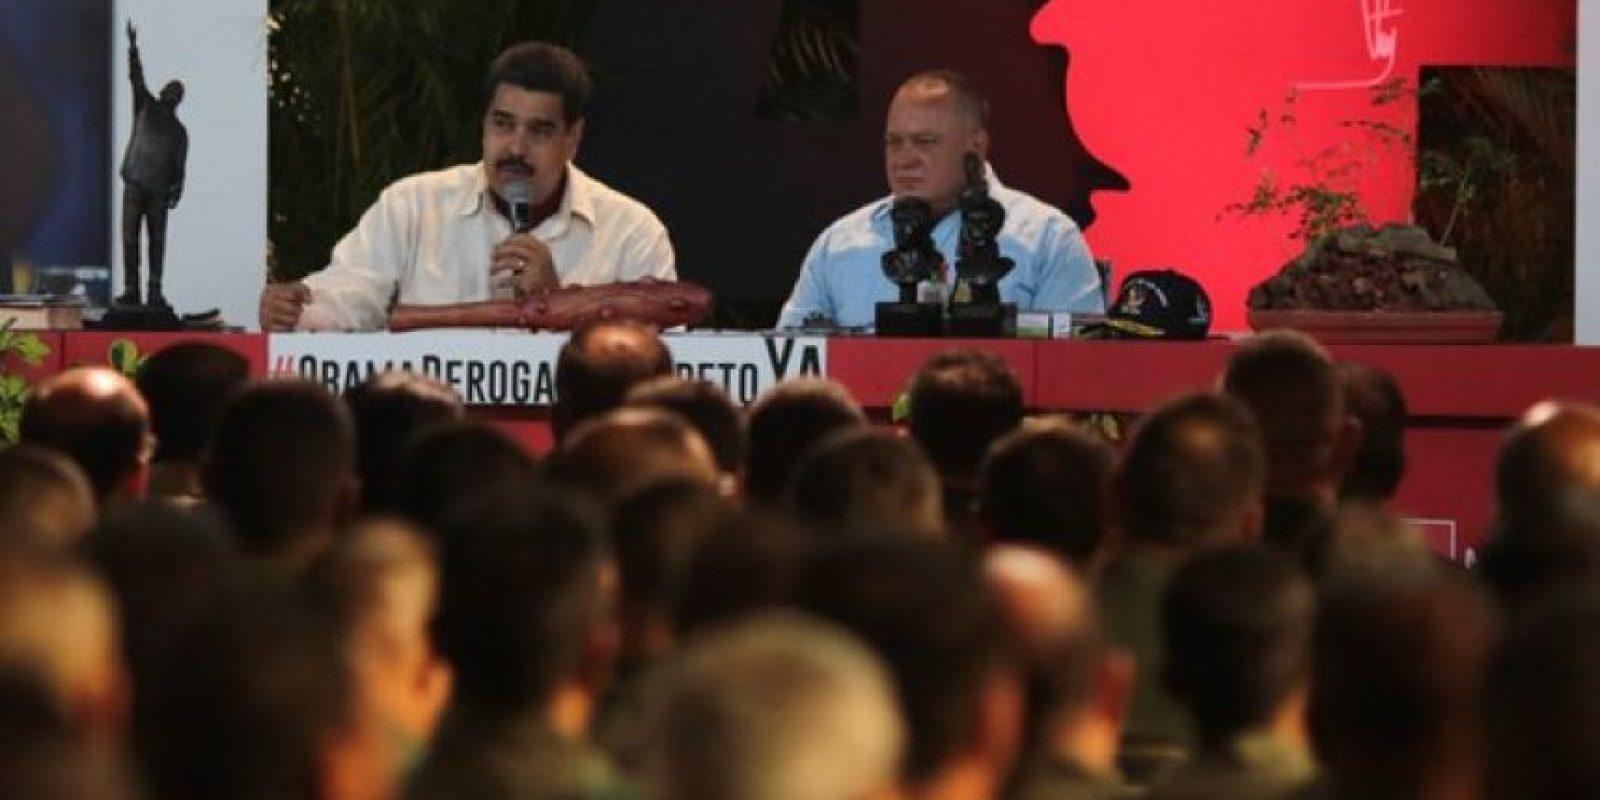 Las 3 crisis que enfrenta Maduro en Venezuela Foto:twitter.com/NicolasMaduro